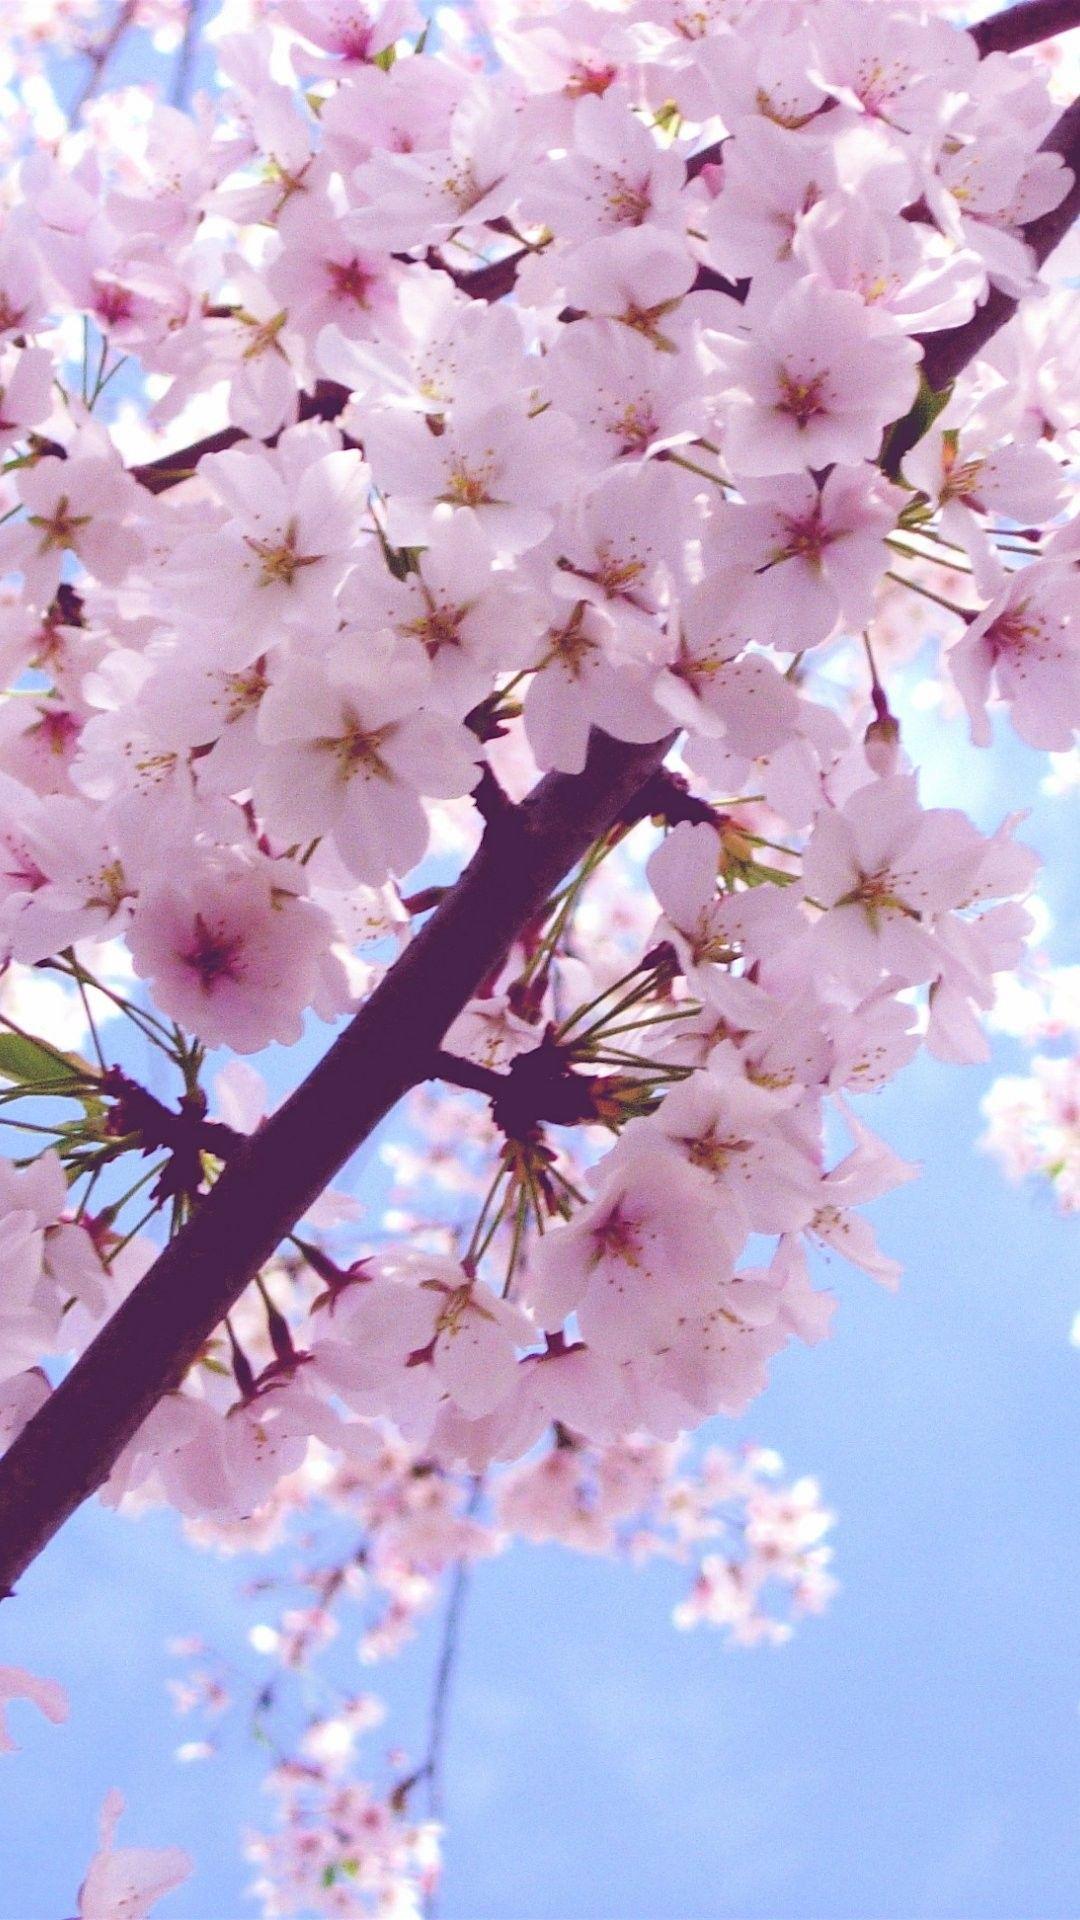 Iphone Wallpaper Cherry Blossom Wallpaper Iphone 134202 Hd